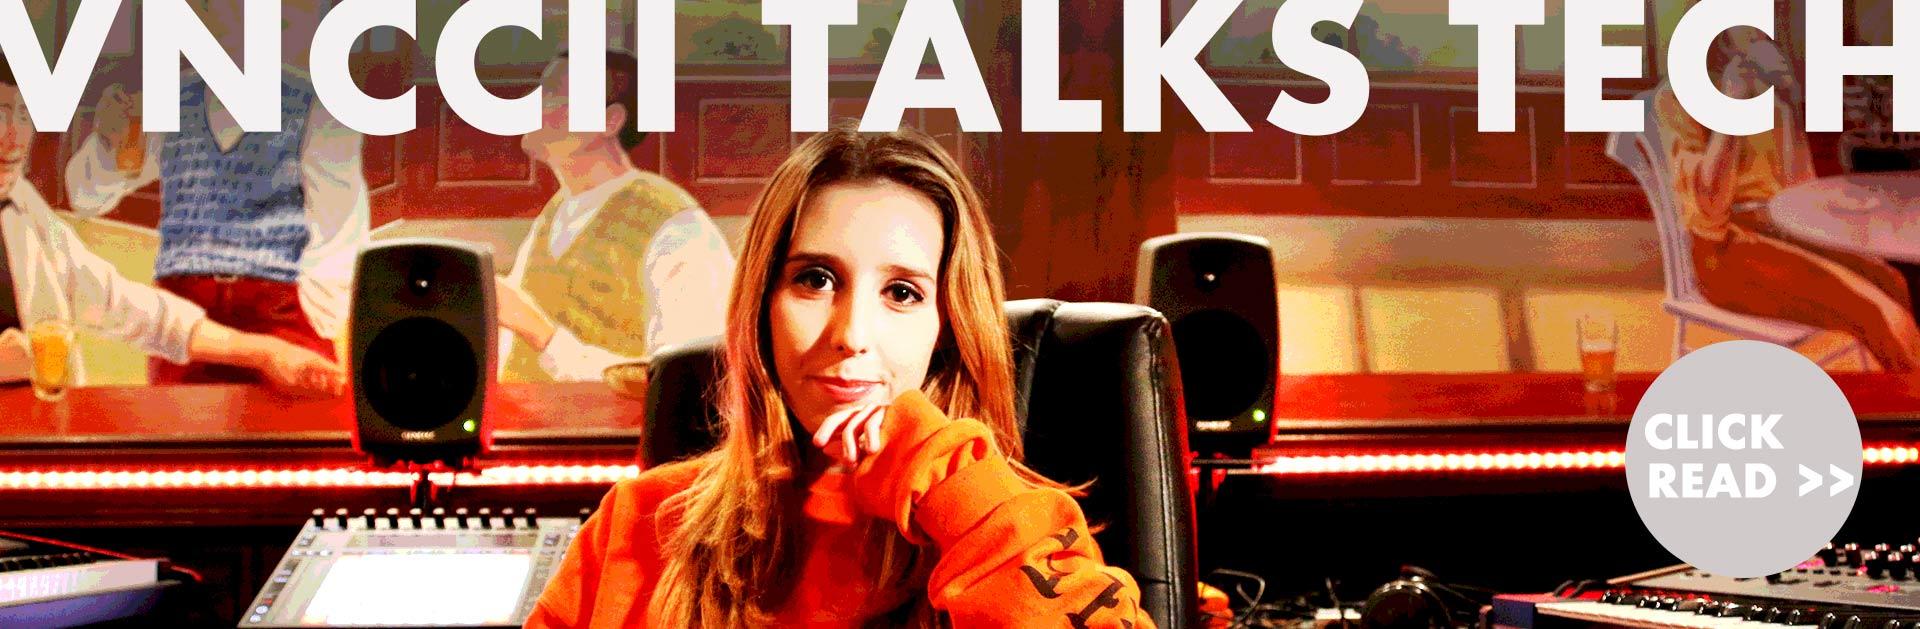 Vnccii Talks about her Genelec SAM Speakers